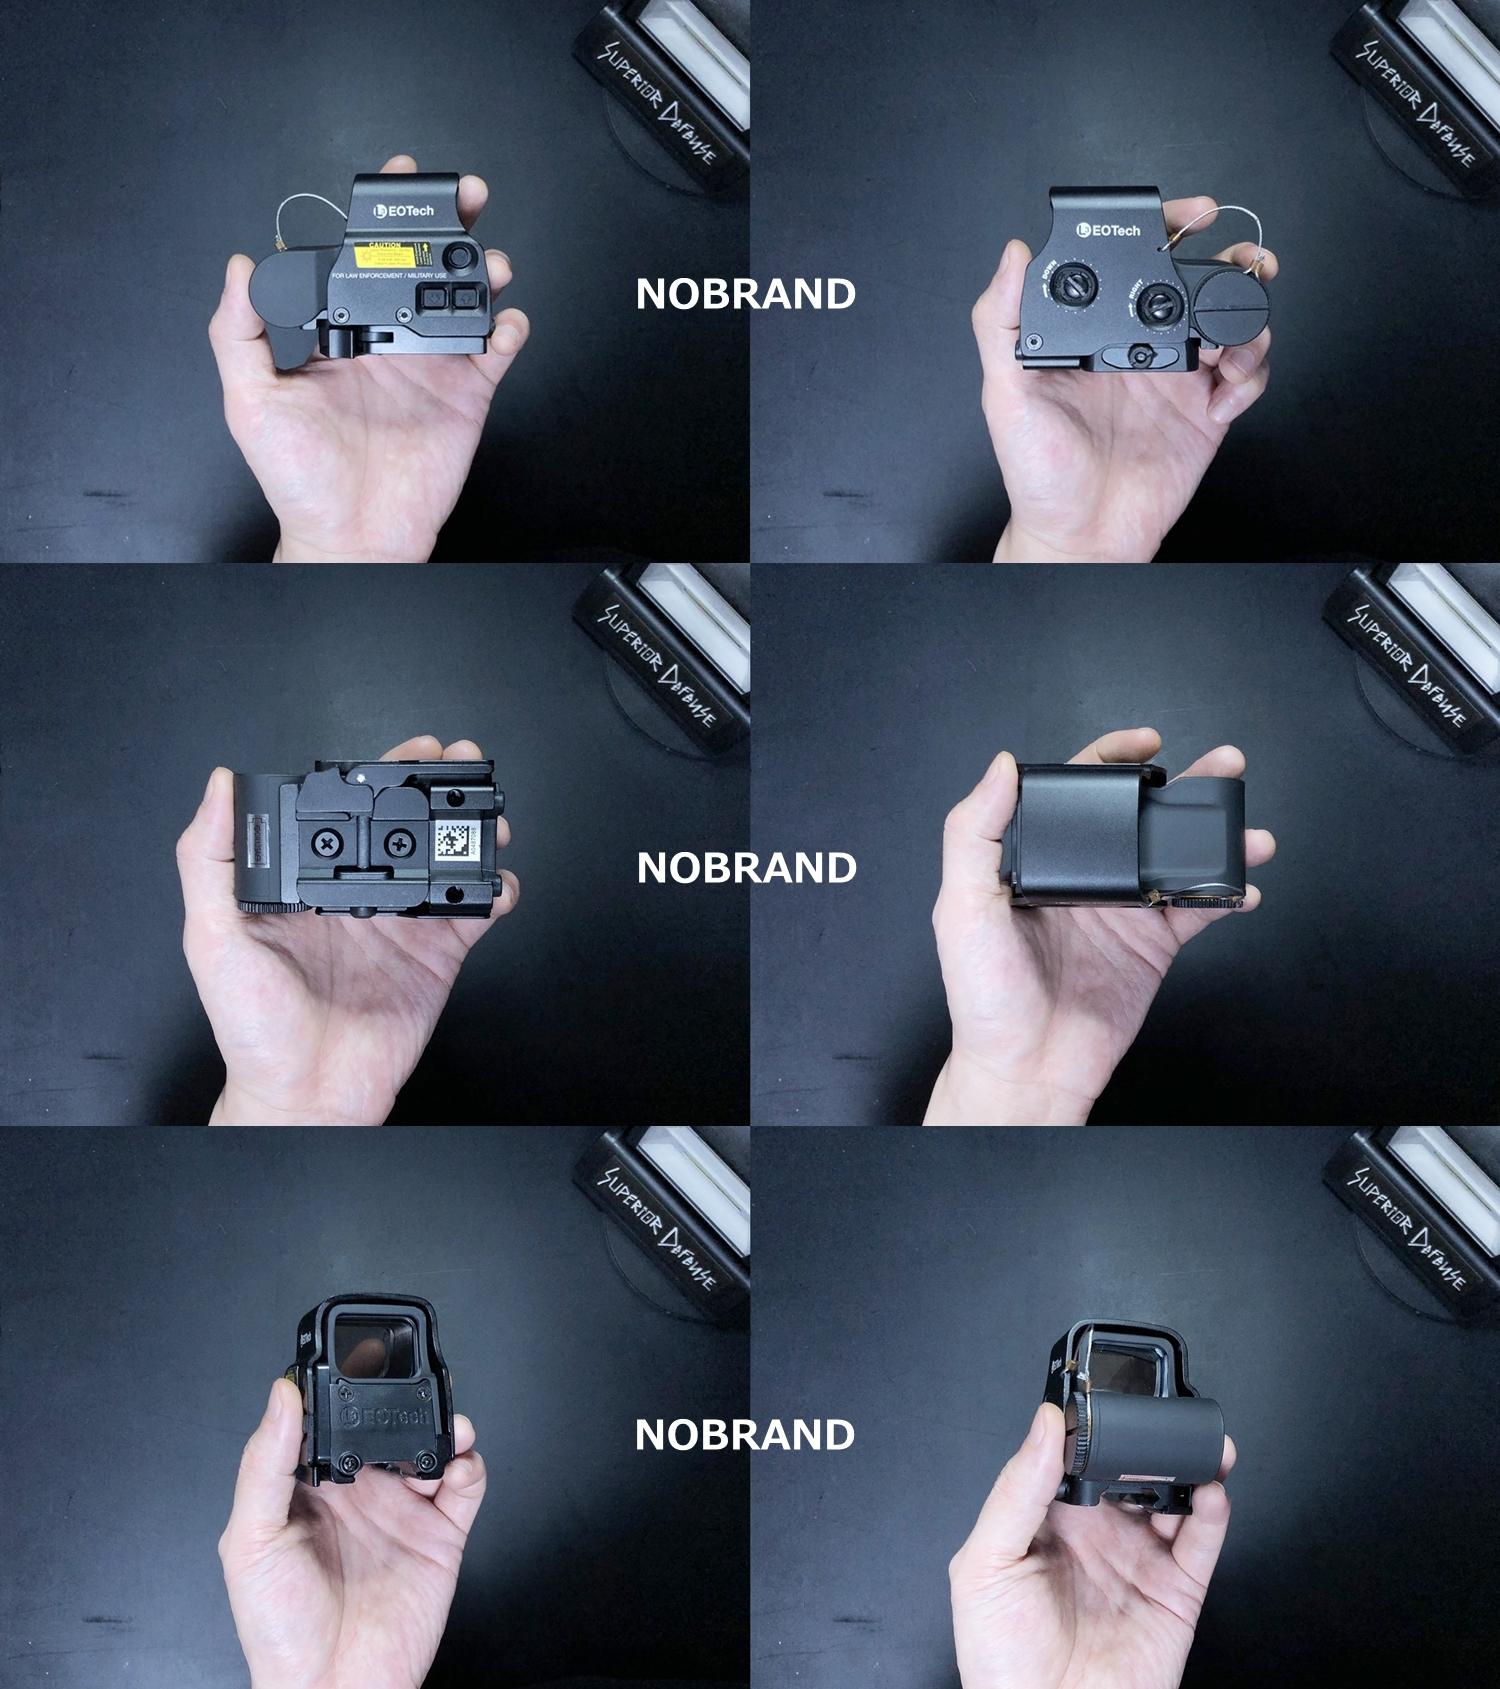 3 EVOLUTION GEAR EOTech EXPS3-0!! 実物 & エボギア & NO BRAND レンズの違い検証!! DEVTRON SCOPECOAT ホロサイト カバー装着!! NOVESKE PIG の仲間が増えました!! 開封 検証 取付 レビュー!!